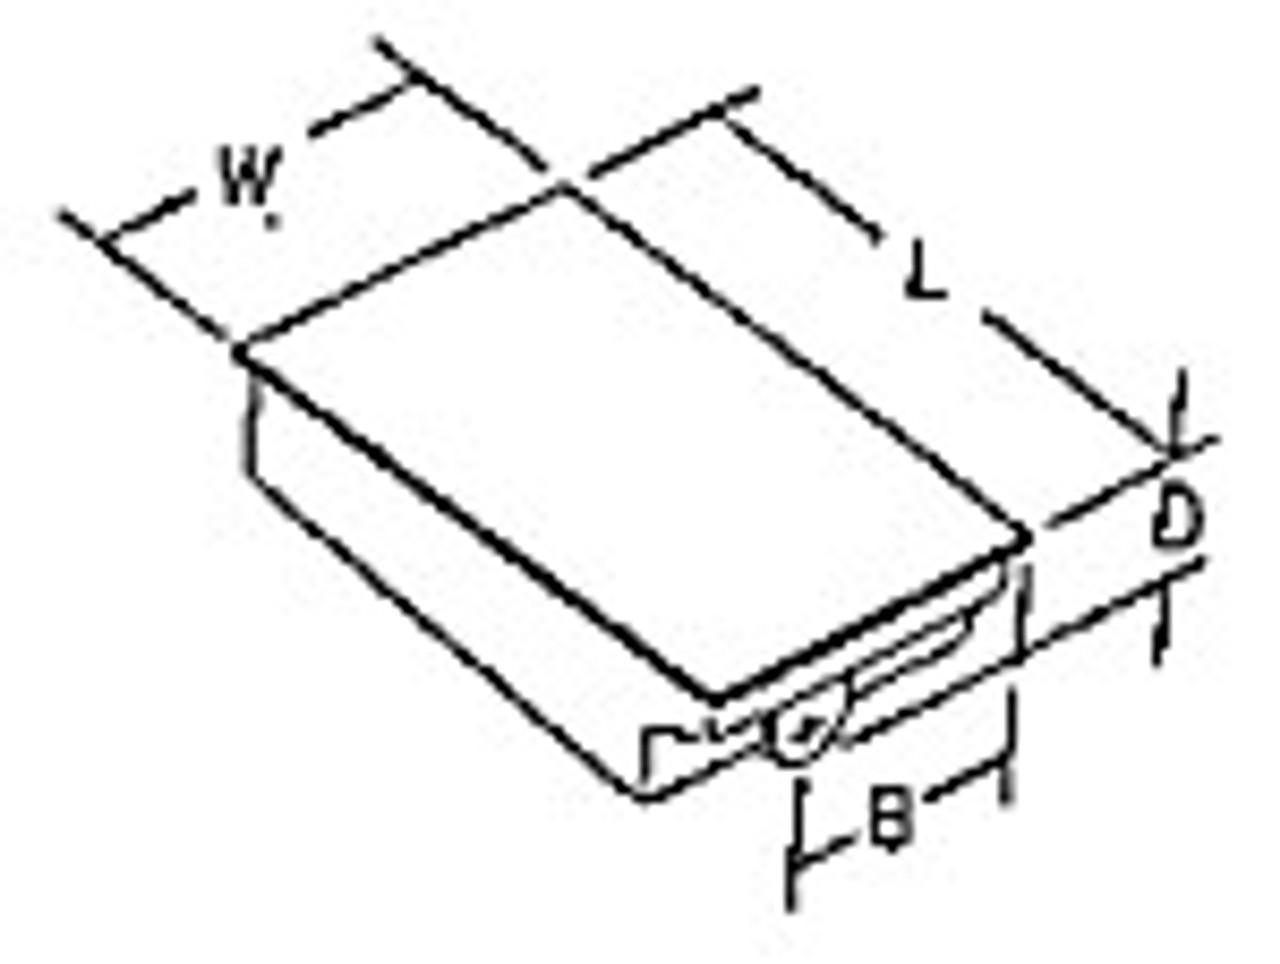 ABS HOLDING TANK END DRAIN - 25 GALLON (11-1067)